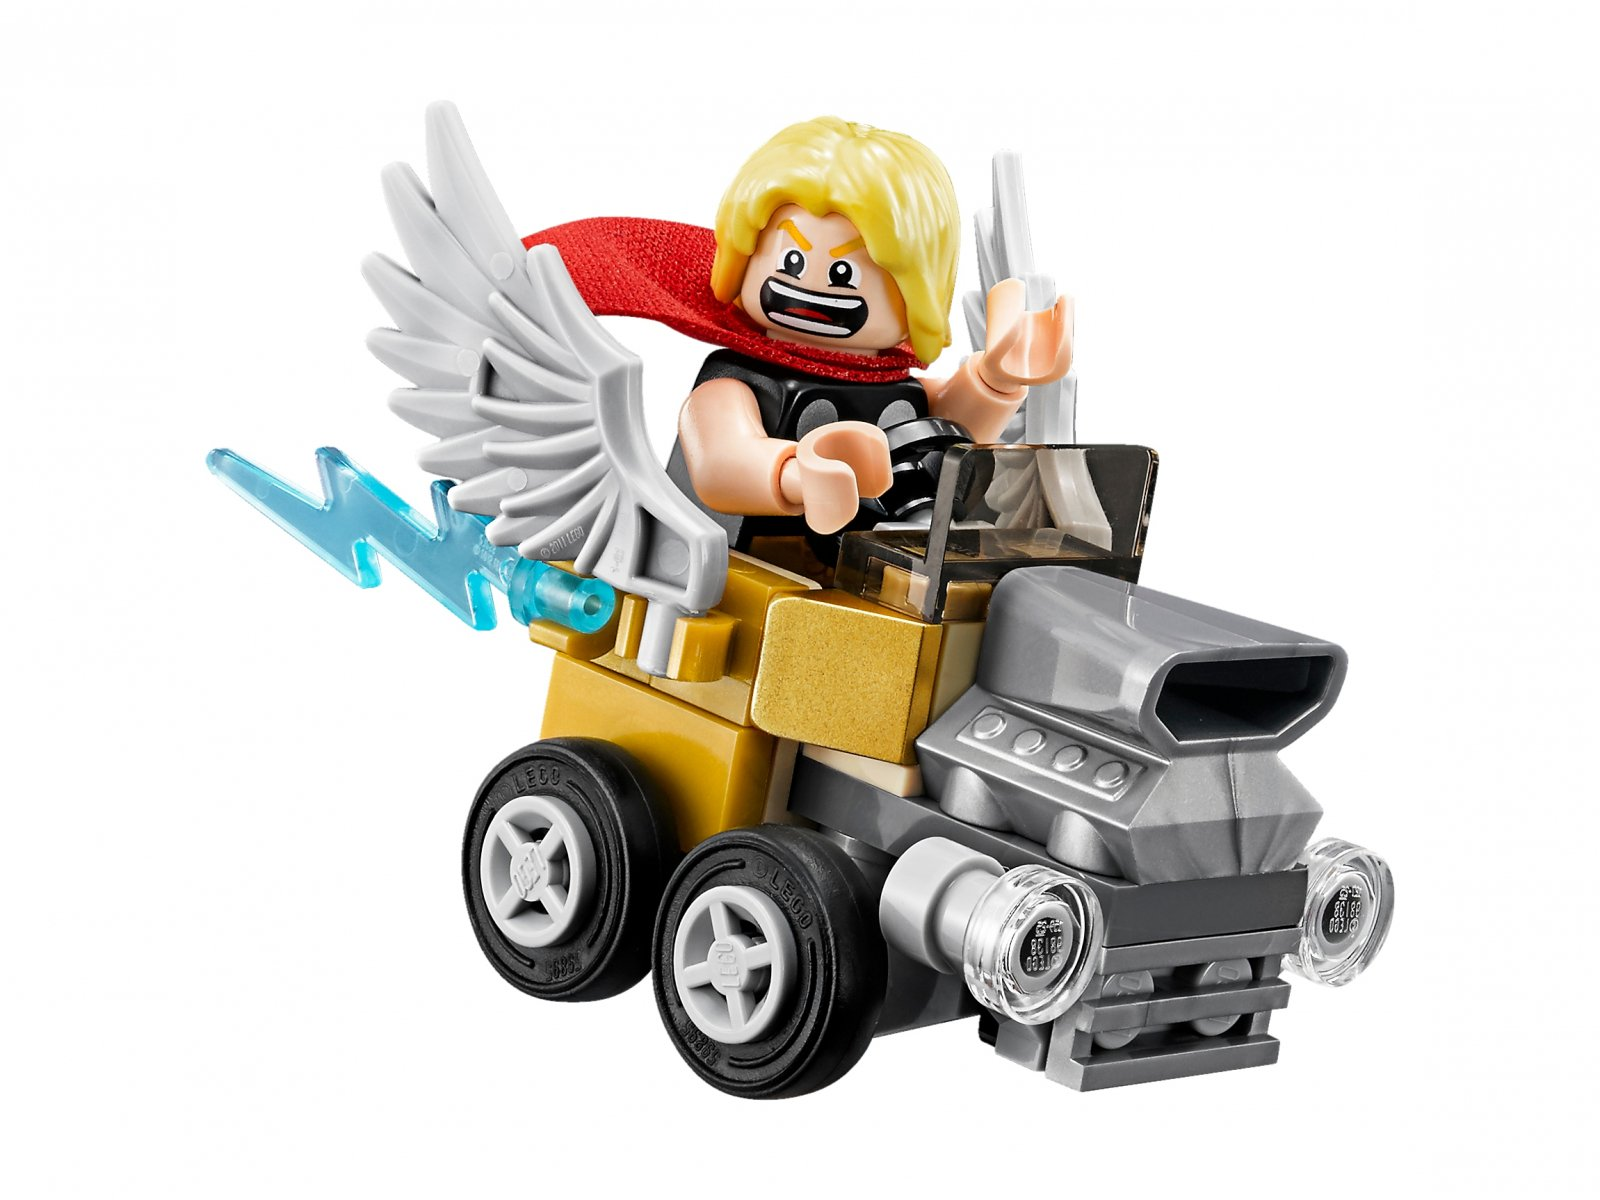 LEGO Marvel Super Heroes Thor vs. Loki